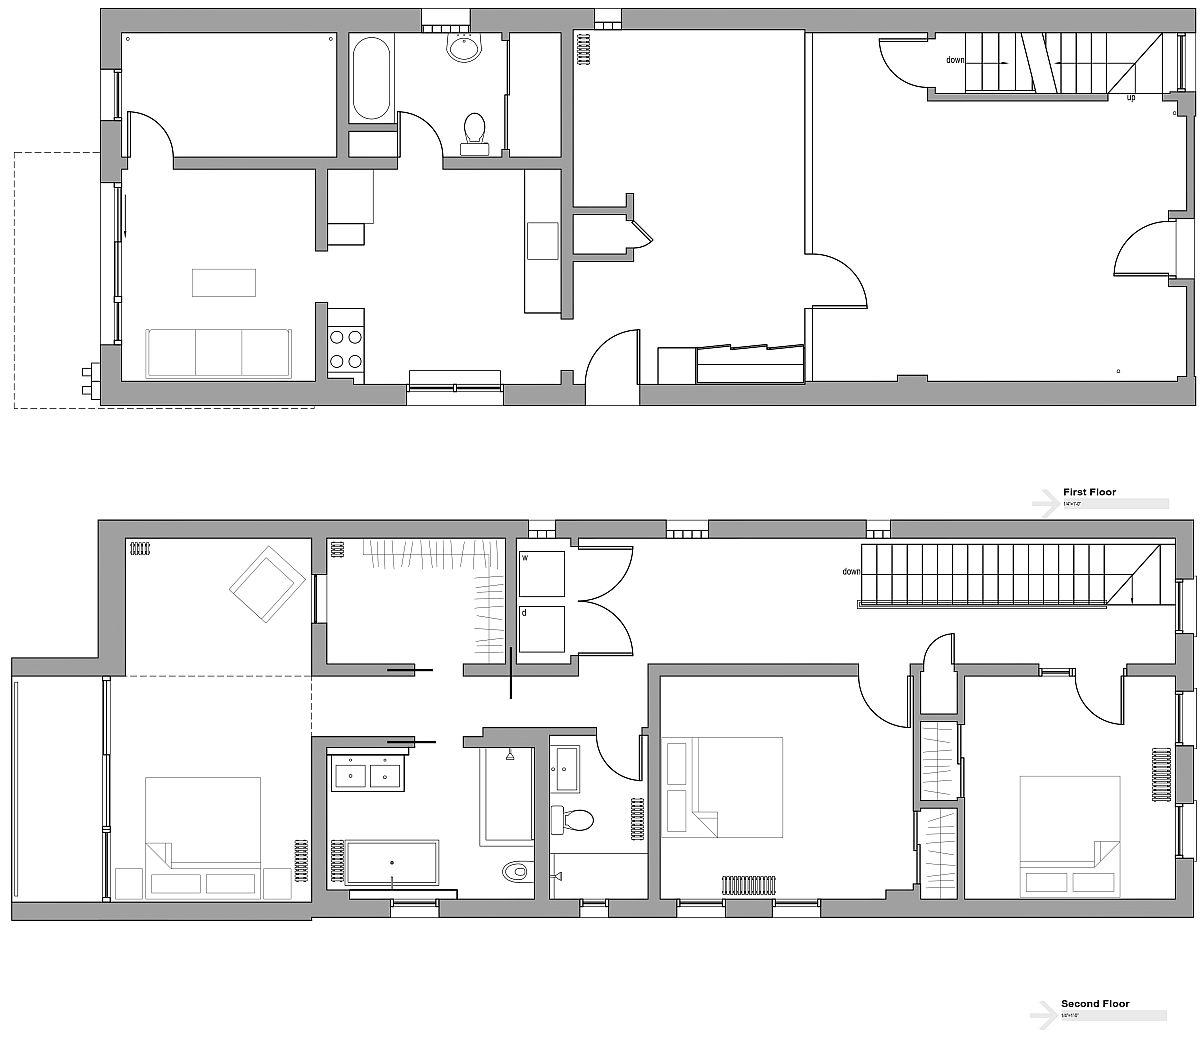 Floor plan of the revamped Cortez Street House